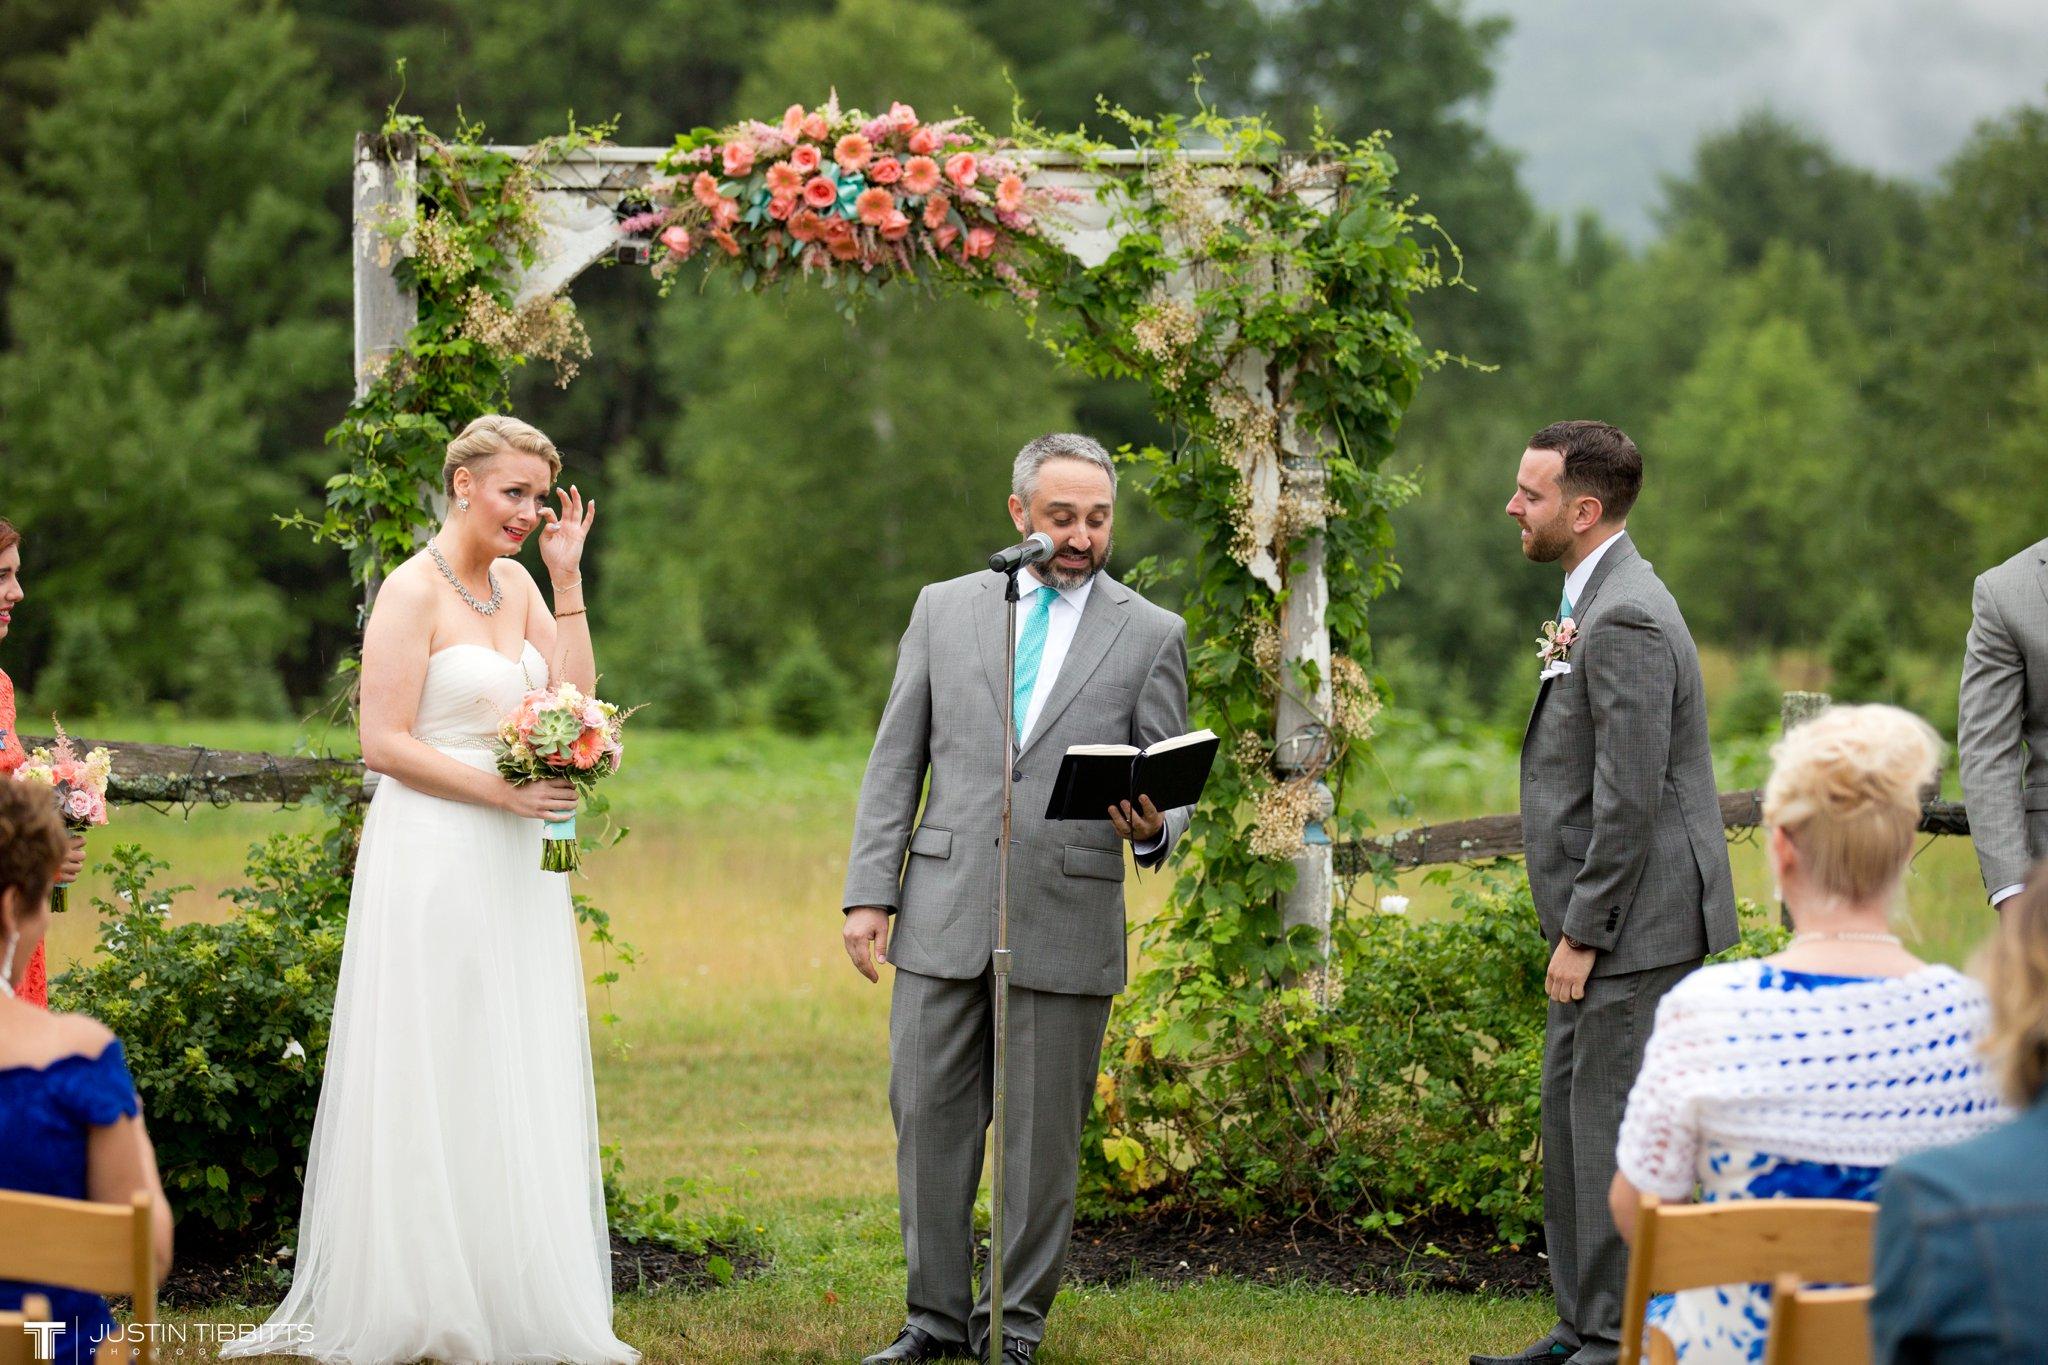 burlap-and-beams-wedding-photos-with-joran-and-molly_0070